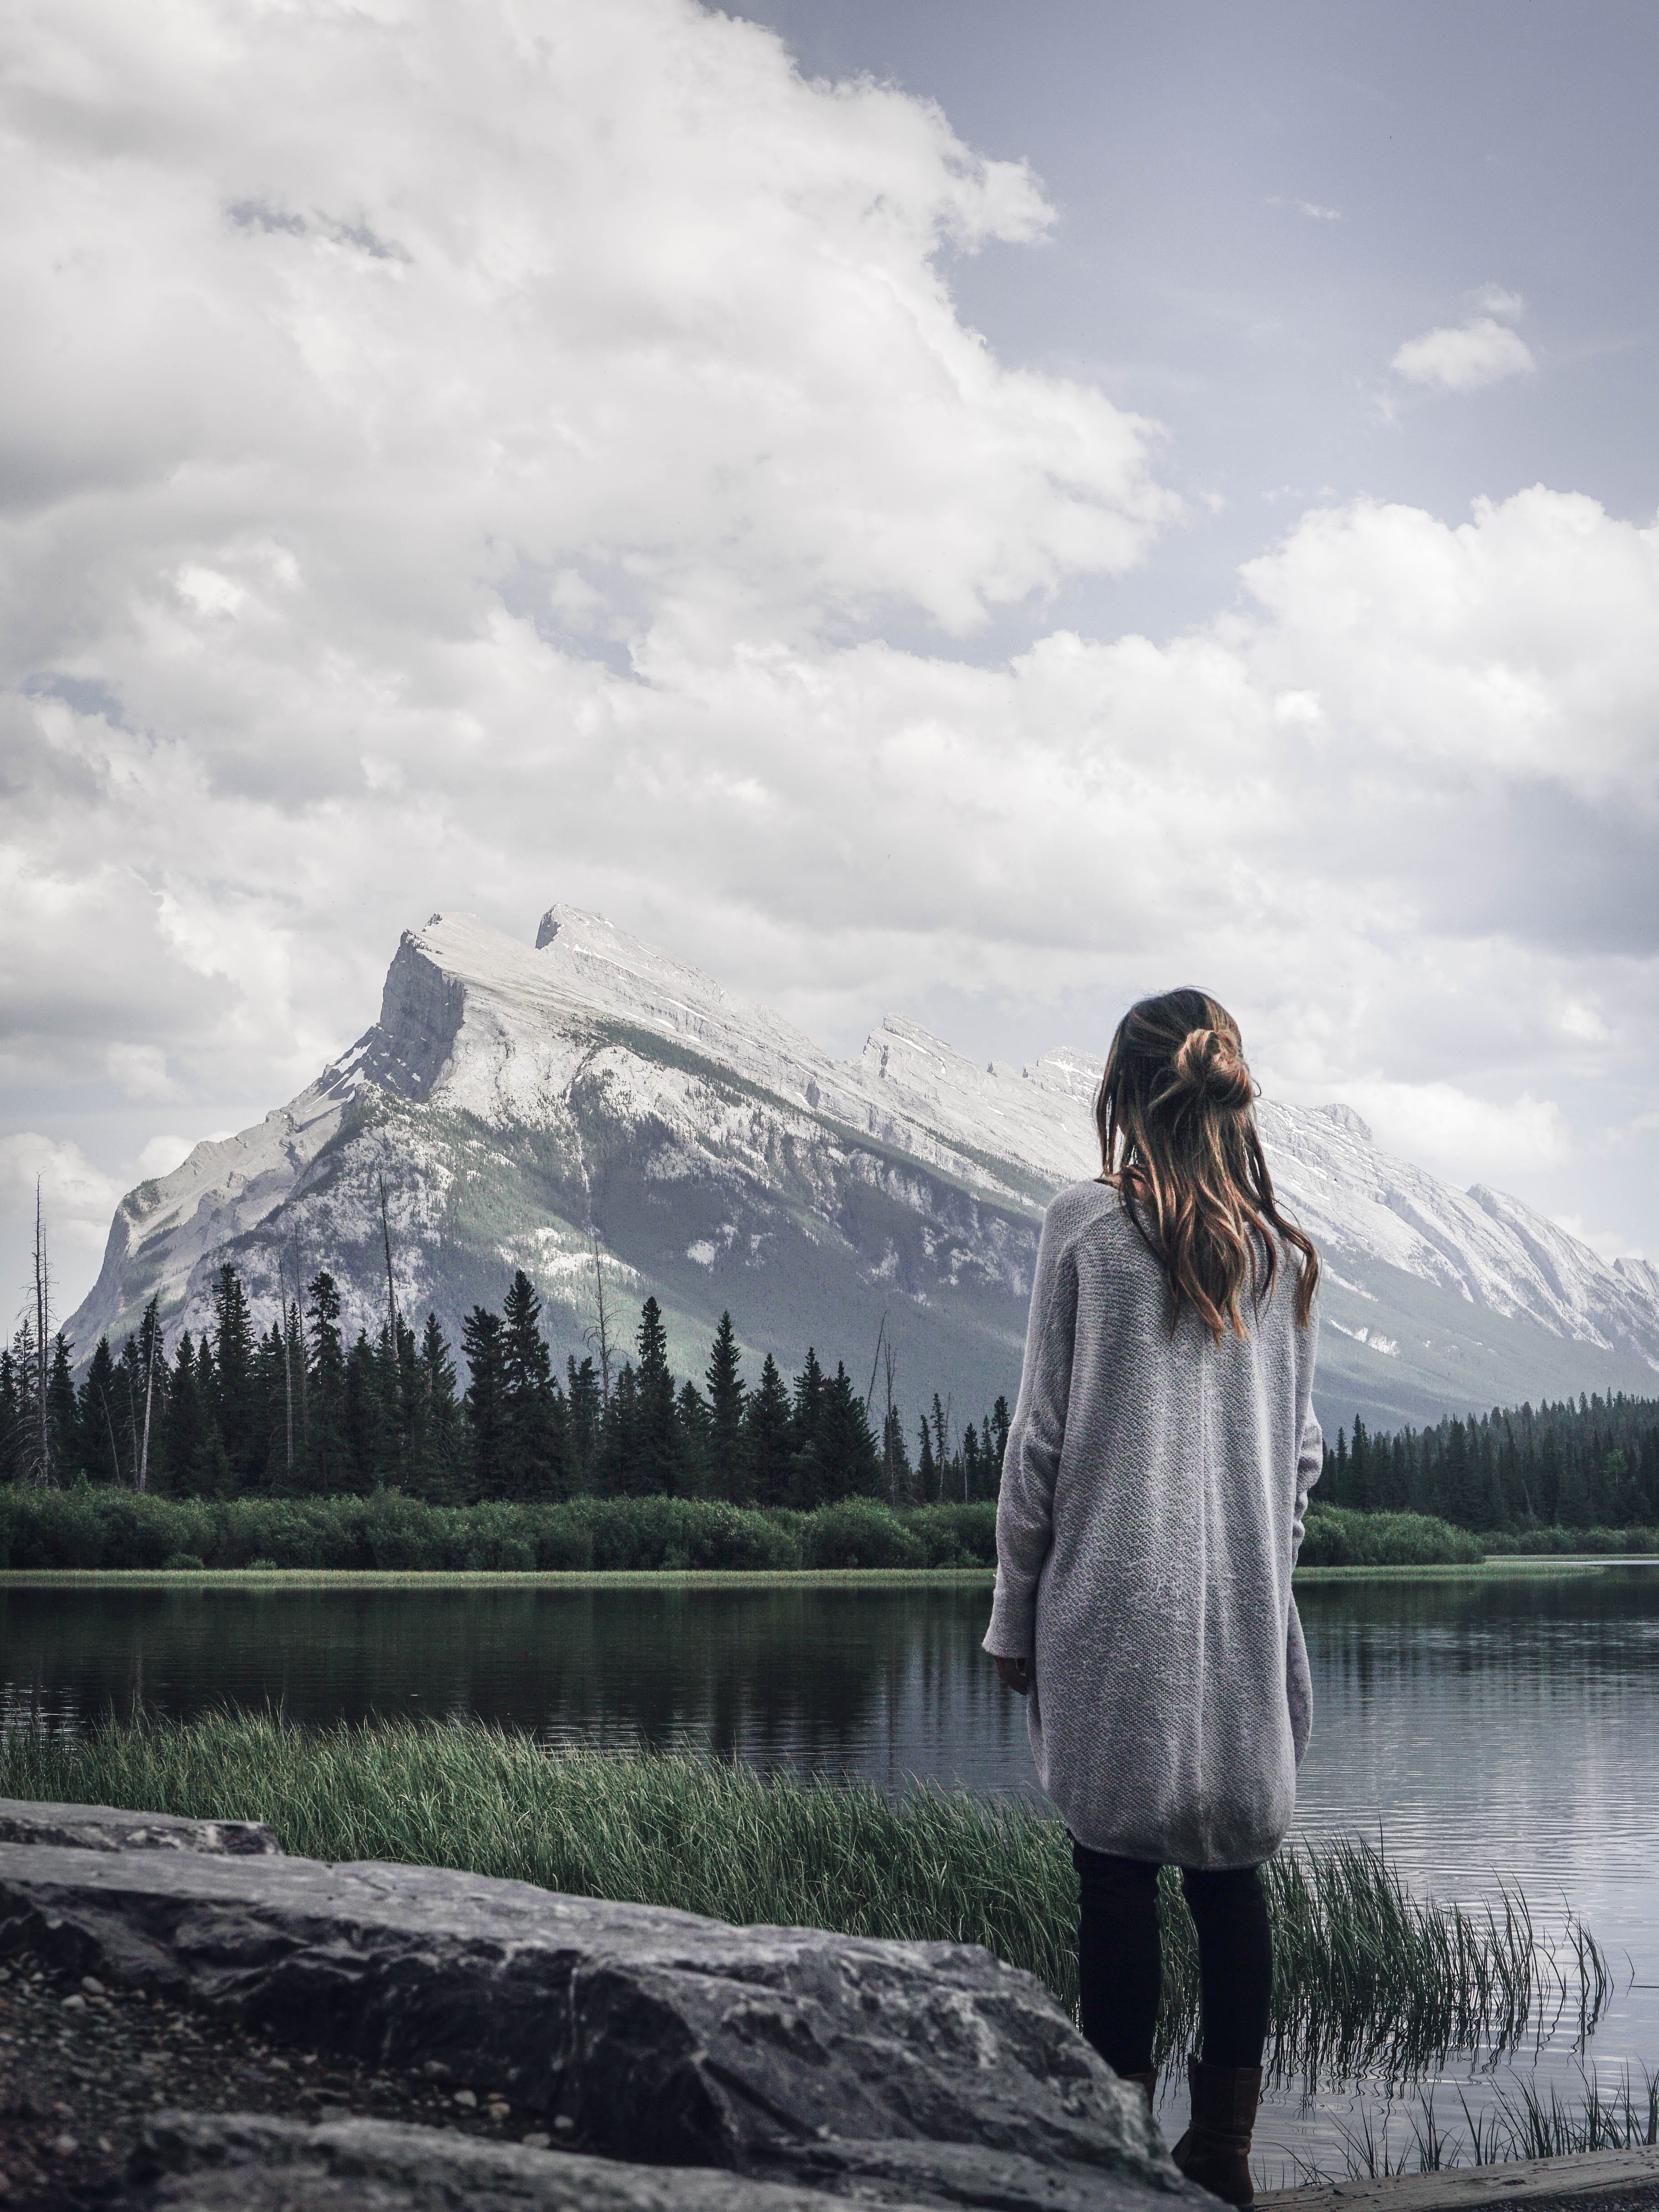 Immagine gratuita di acqua, cielo, femmina, in piedi